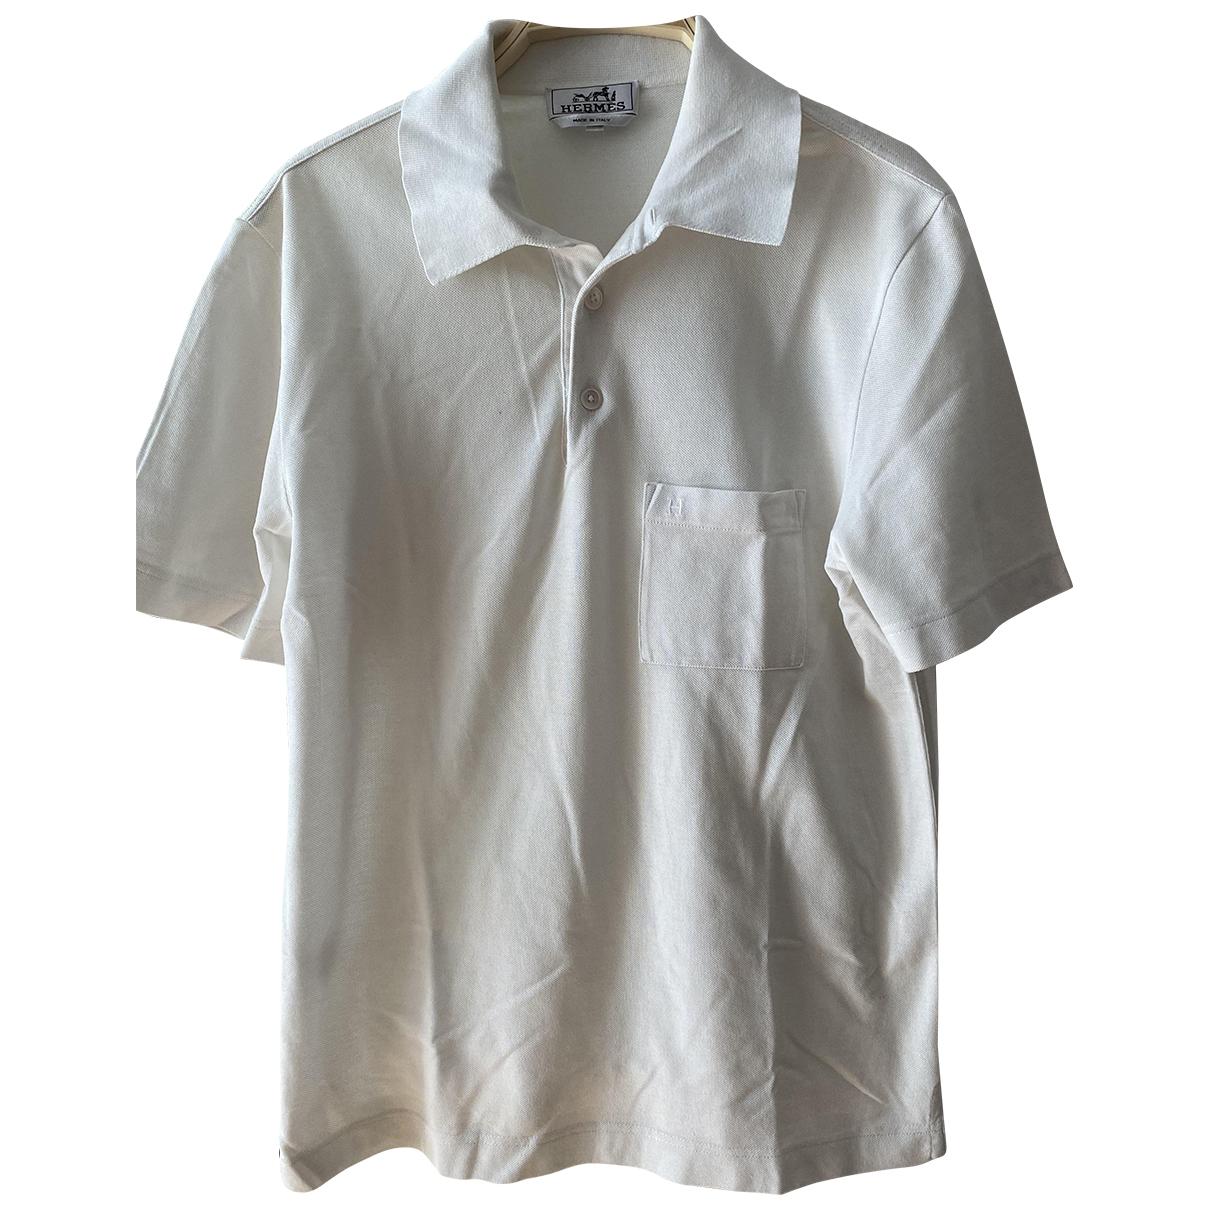 Hermes \N Poloshirts in  Weiss Baumwolle